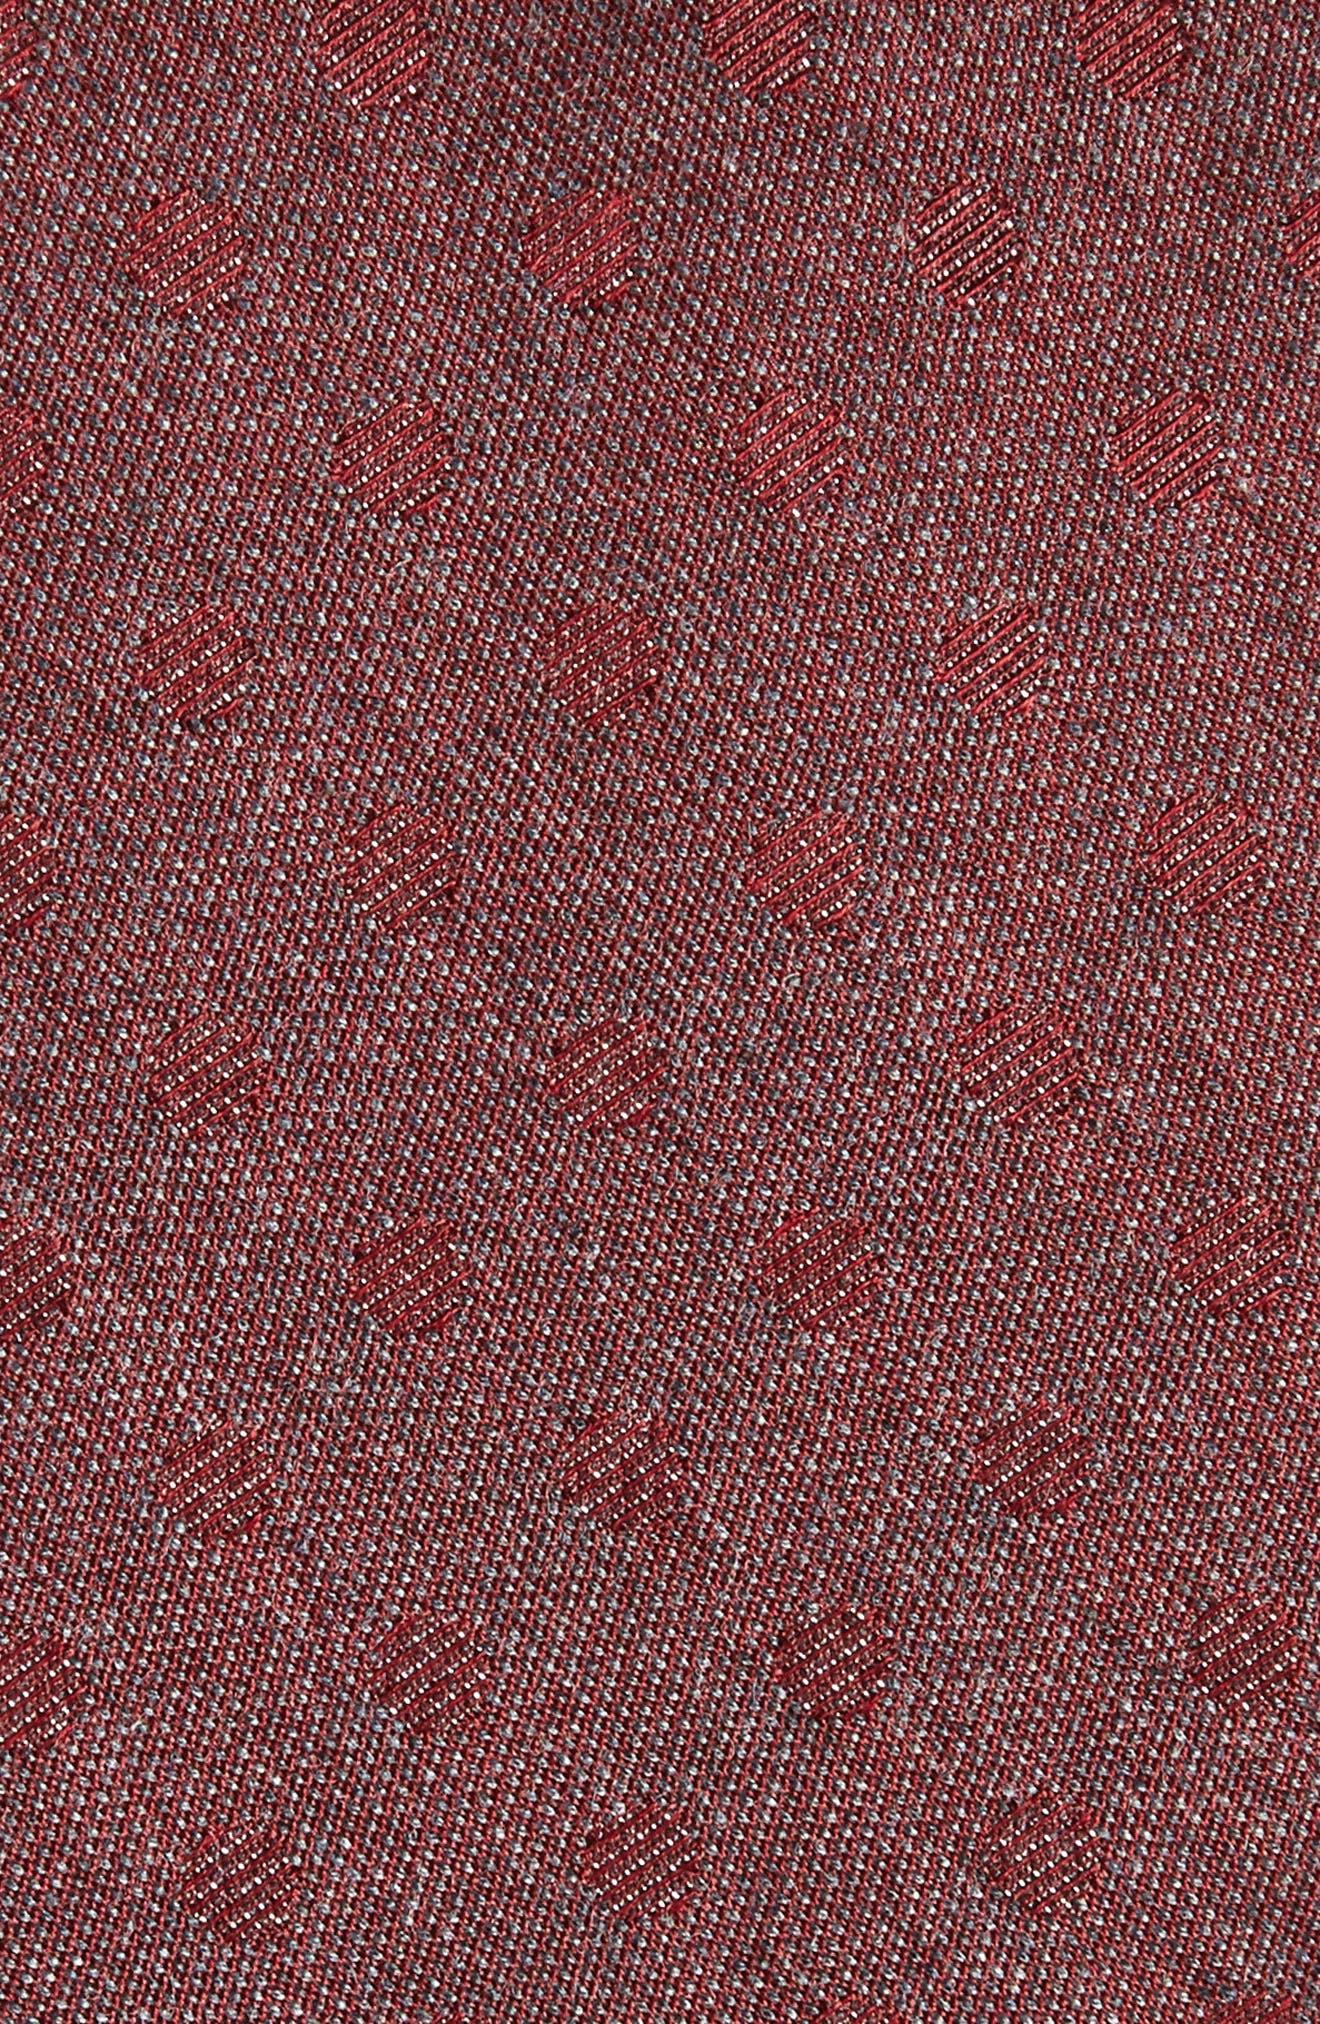 Lang Dot Tie,                             Alternate thumbnail 6, color,